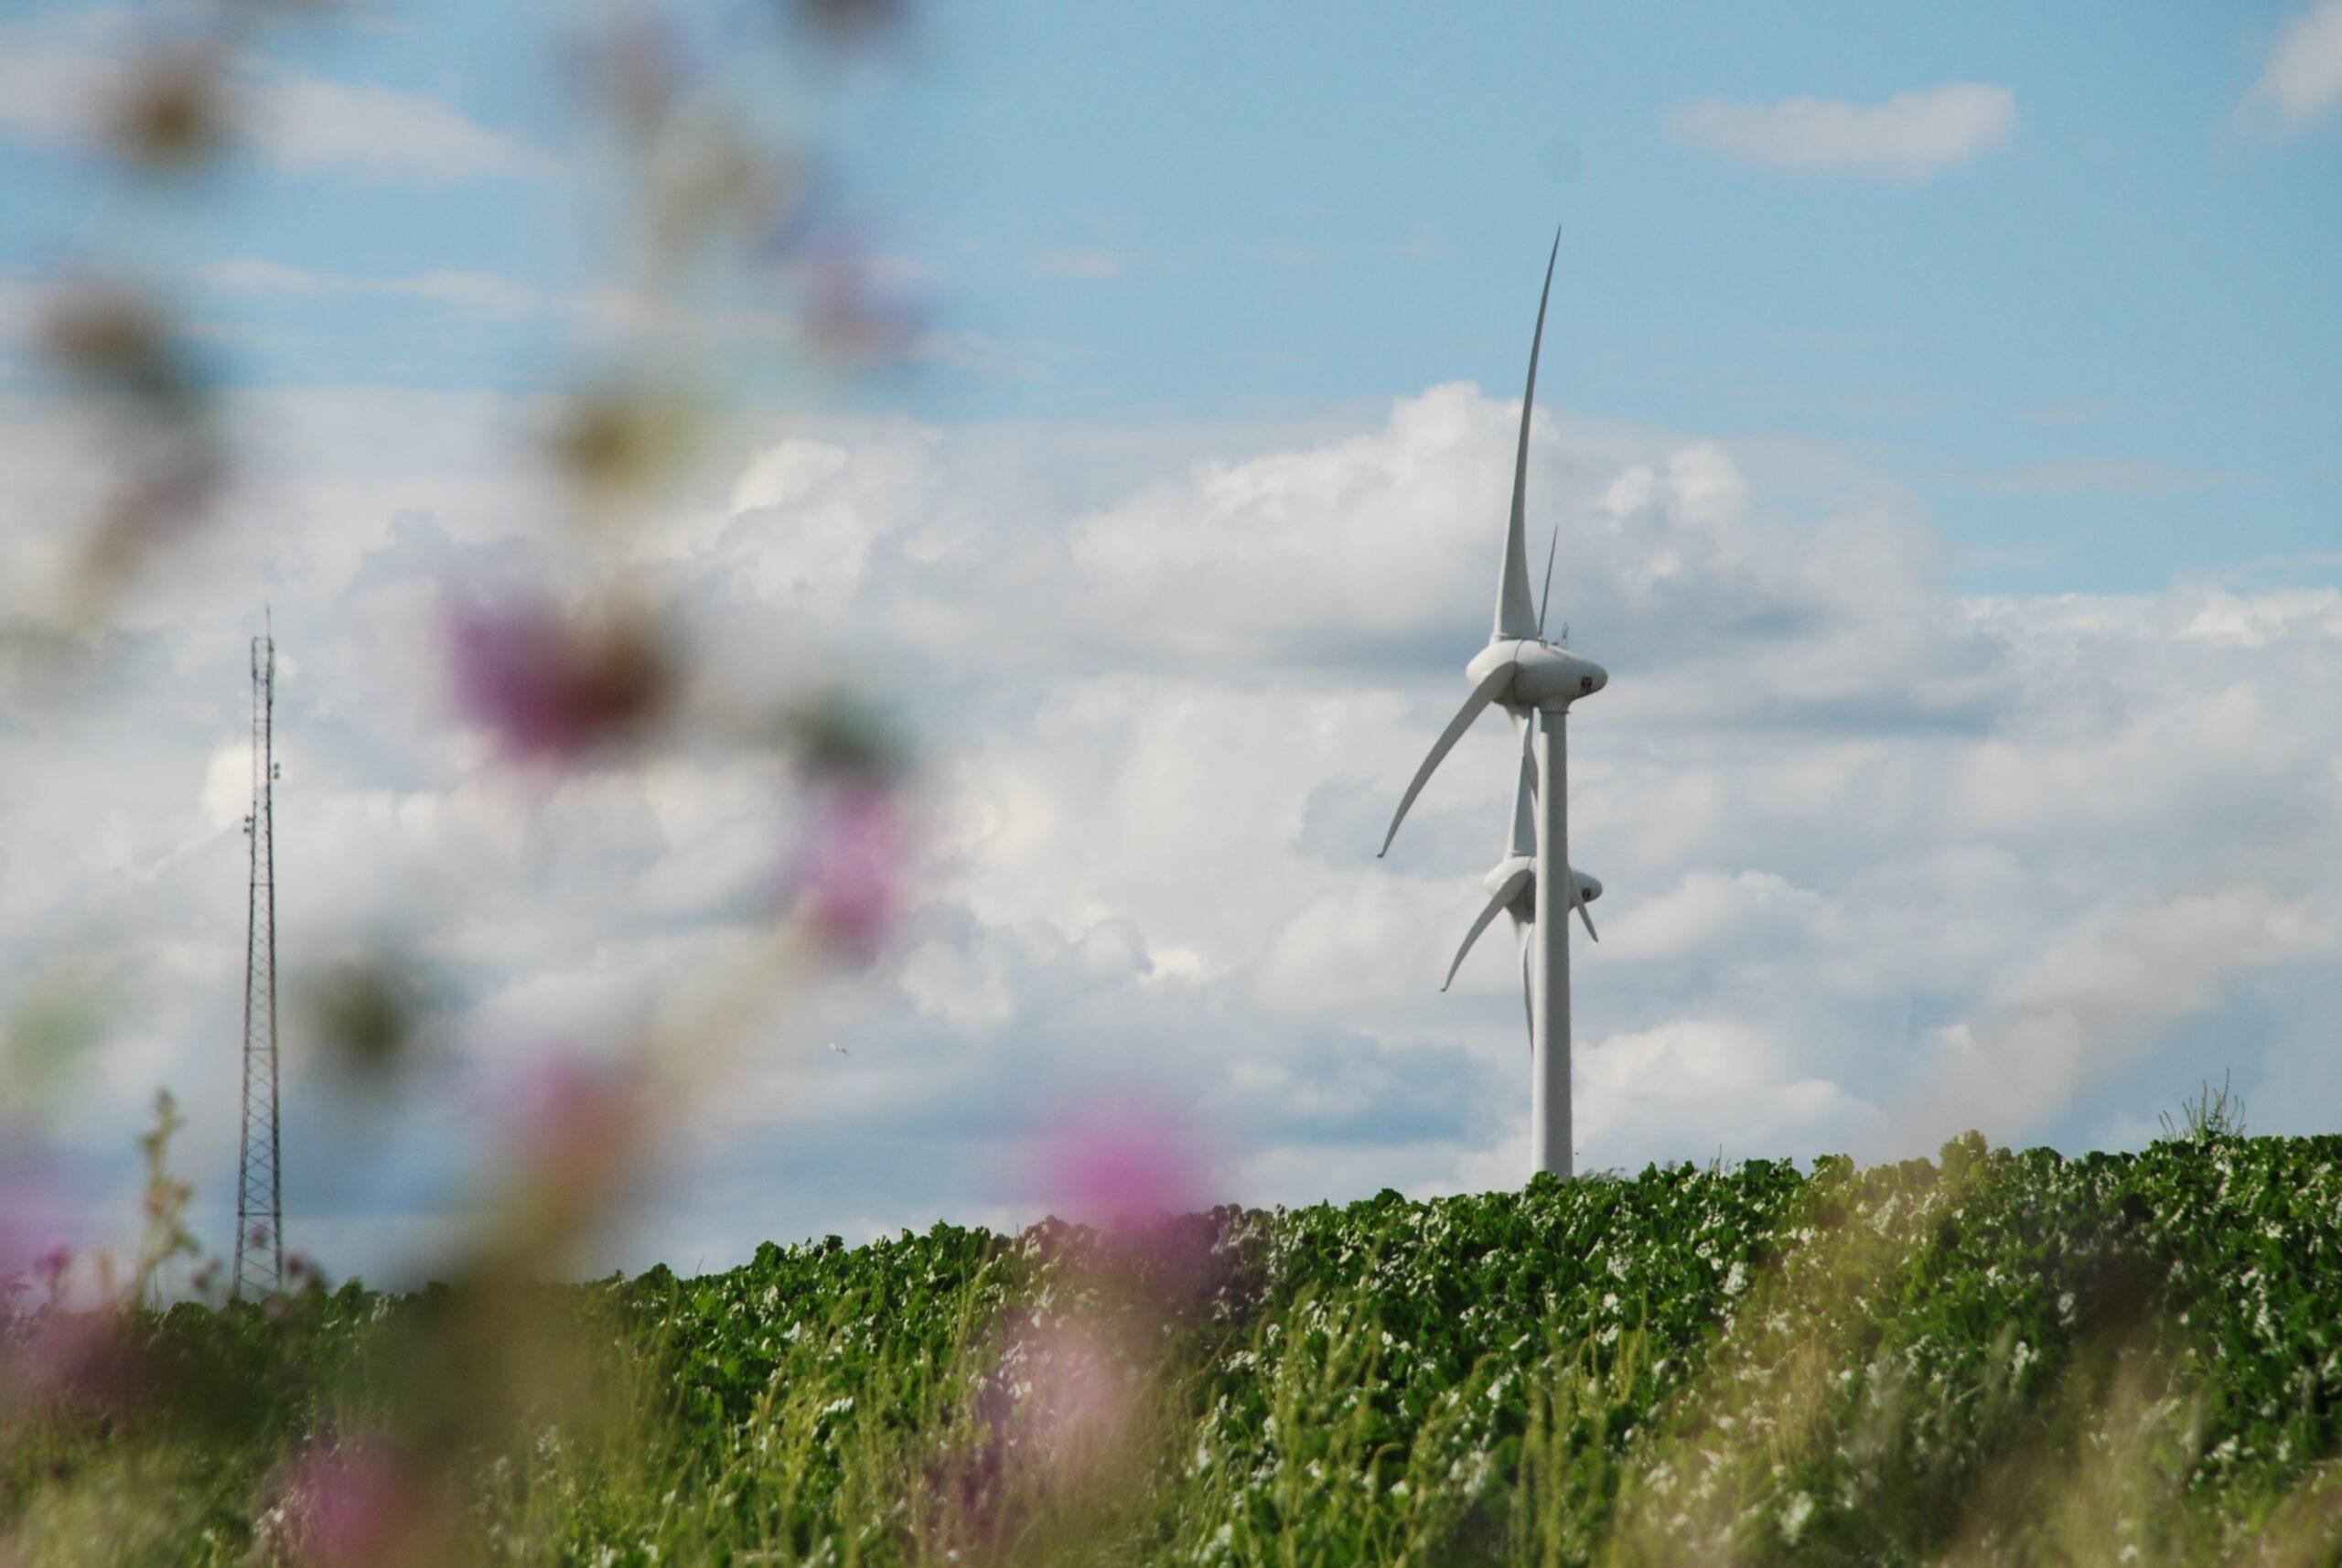 Vindkraftverk på en åker